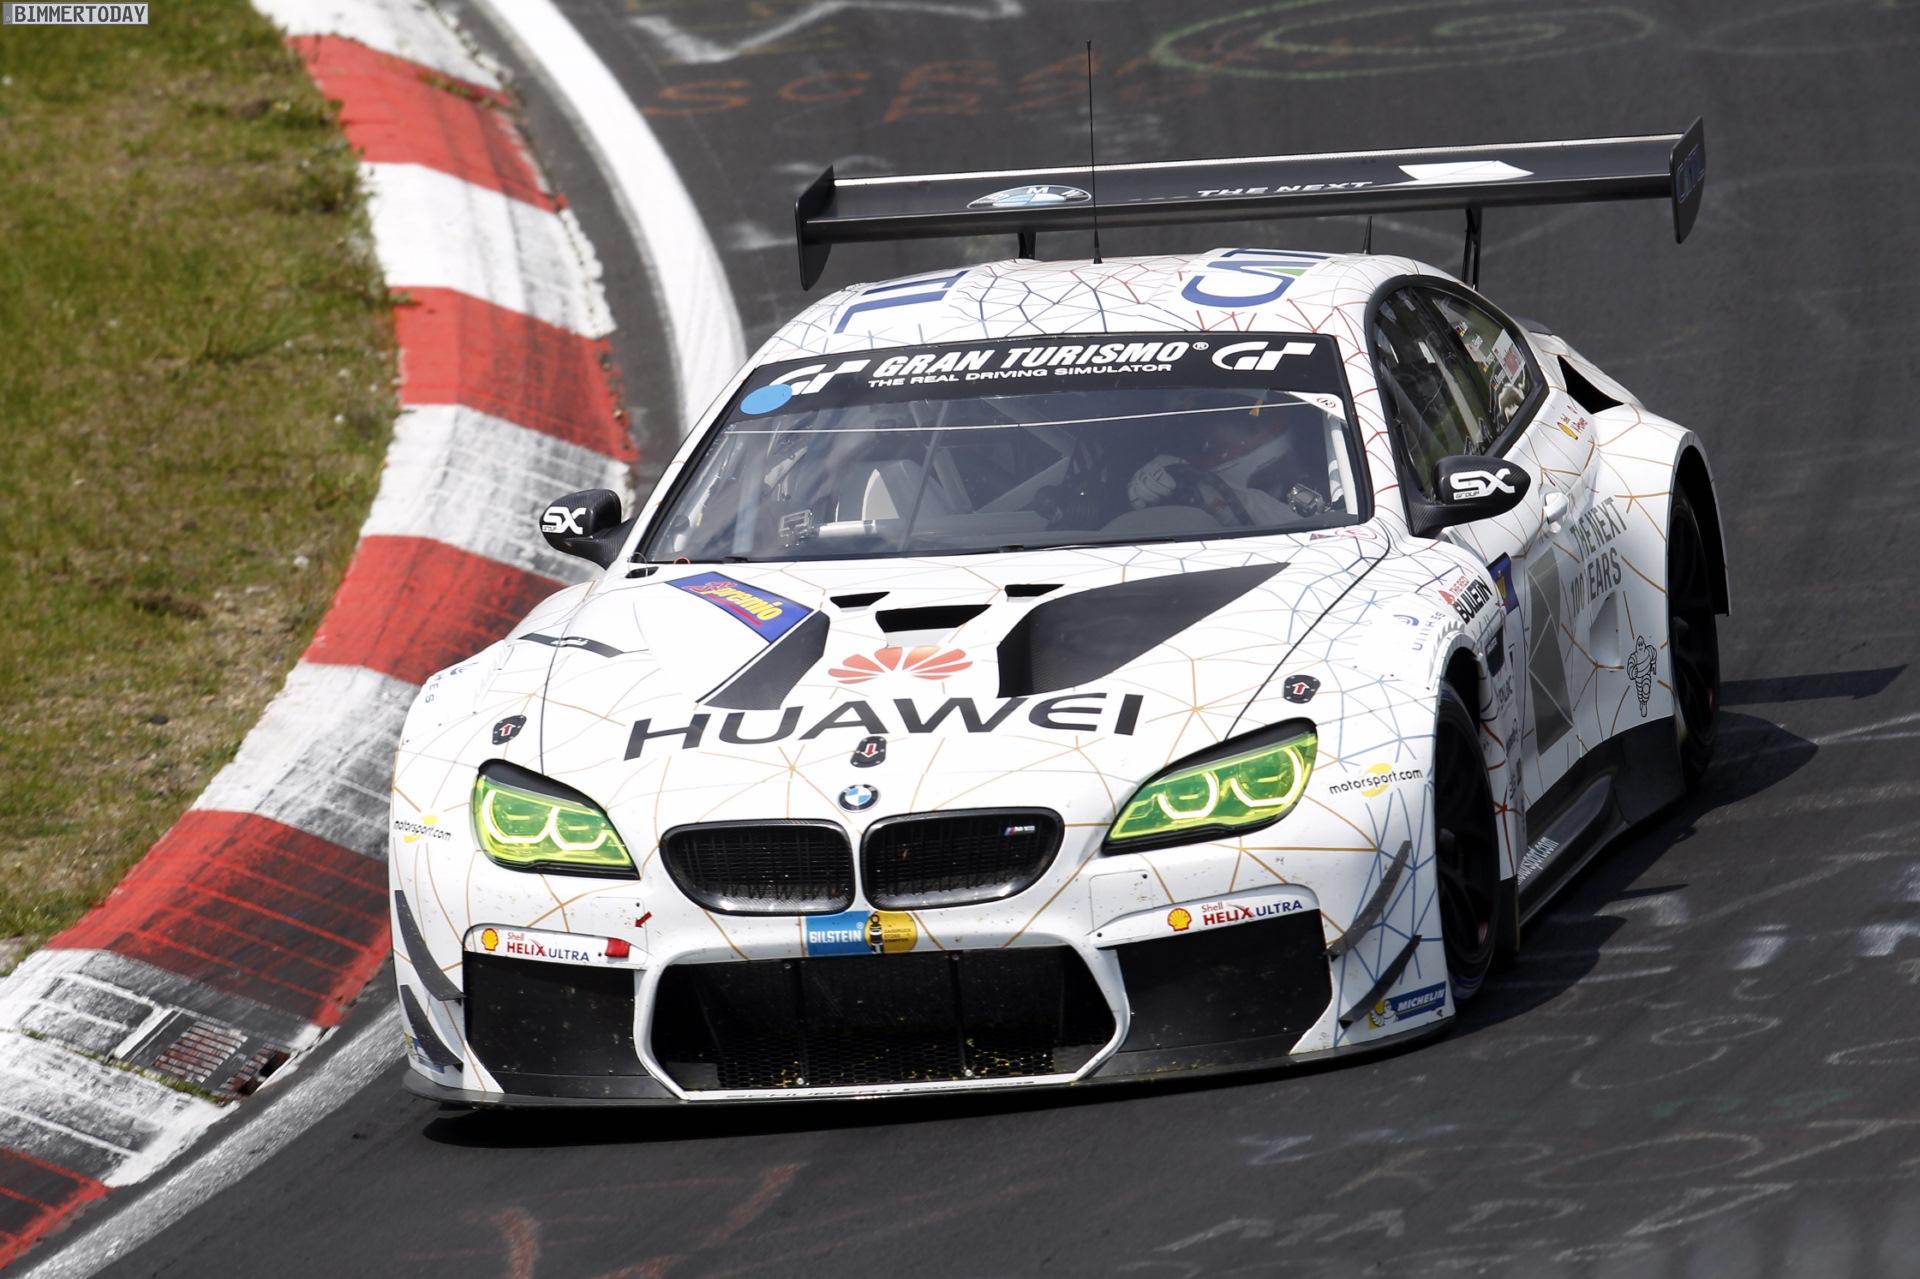 24h N 252 Rburgring 2016 Bmw M6 Gt3 Im Kreis Der Favoriten